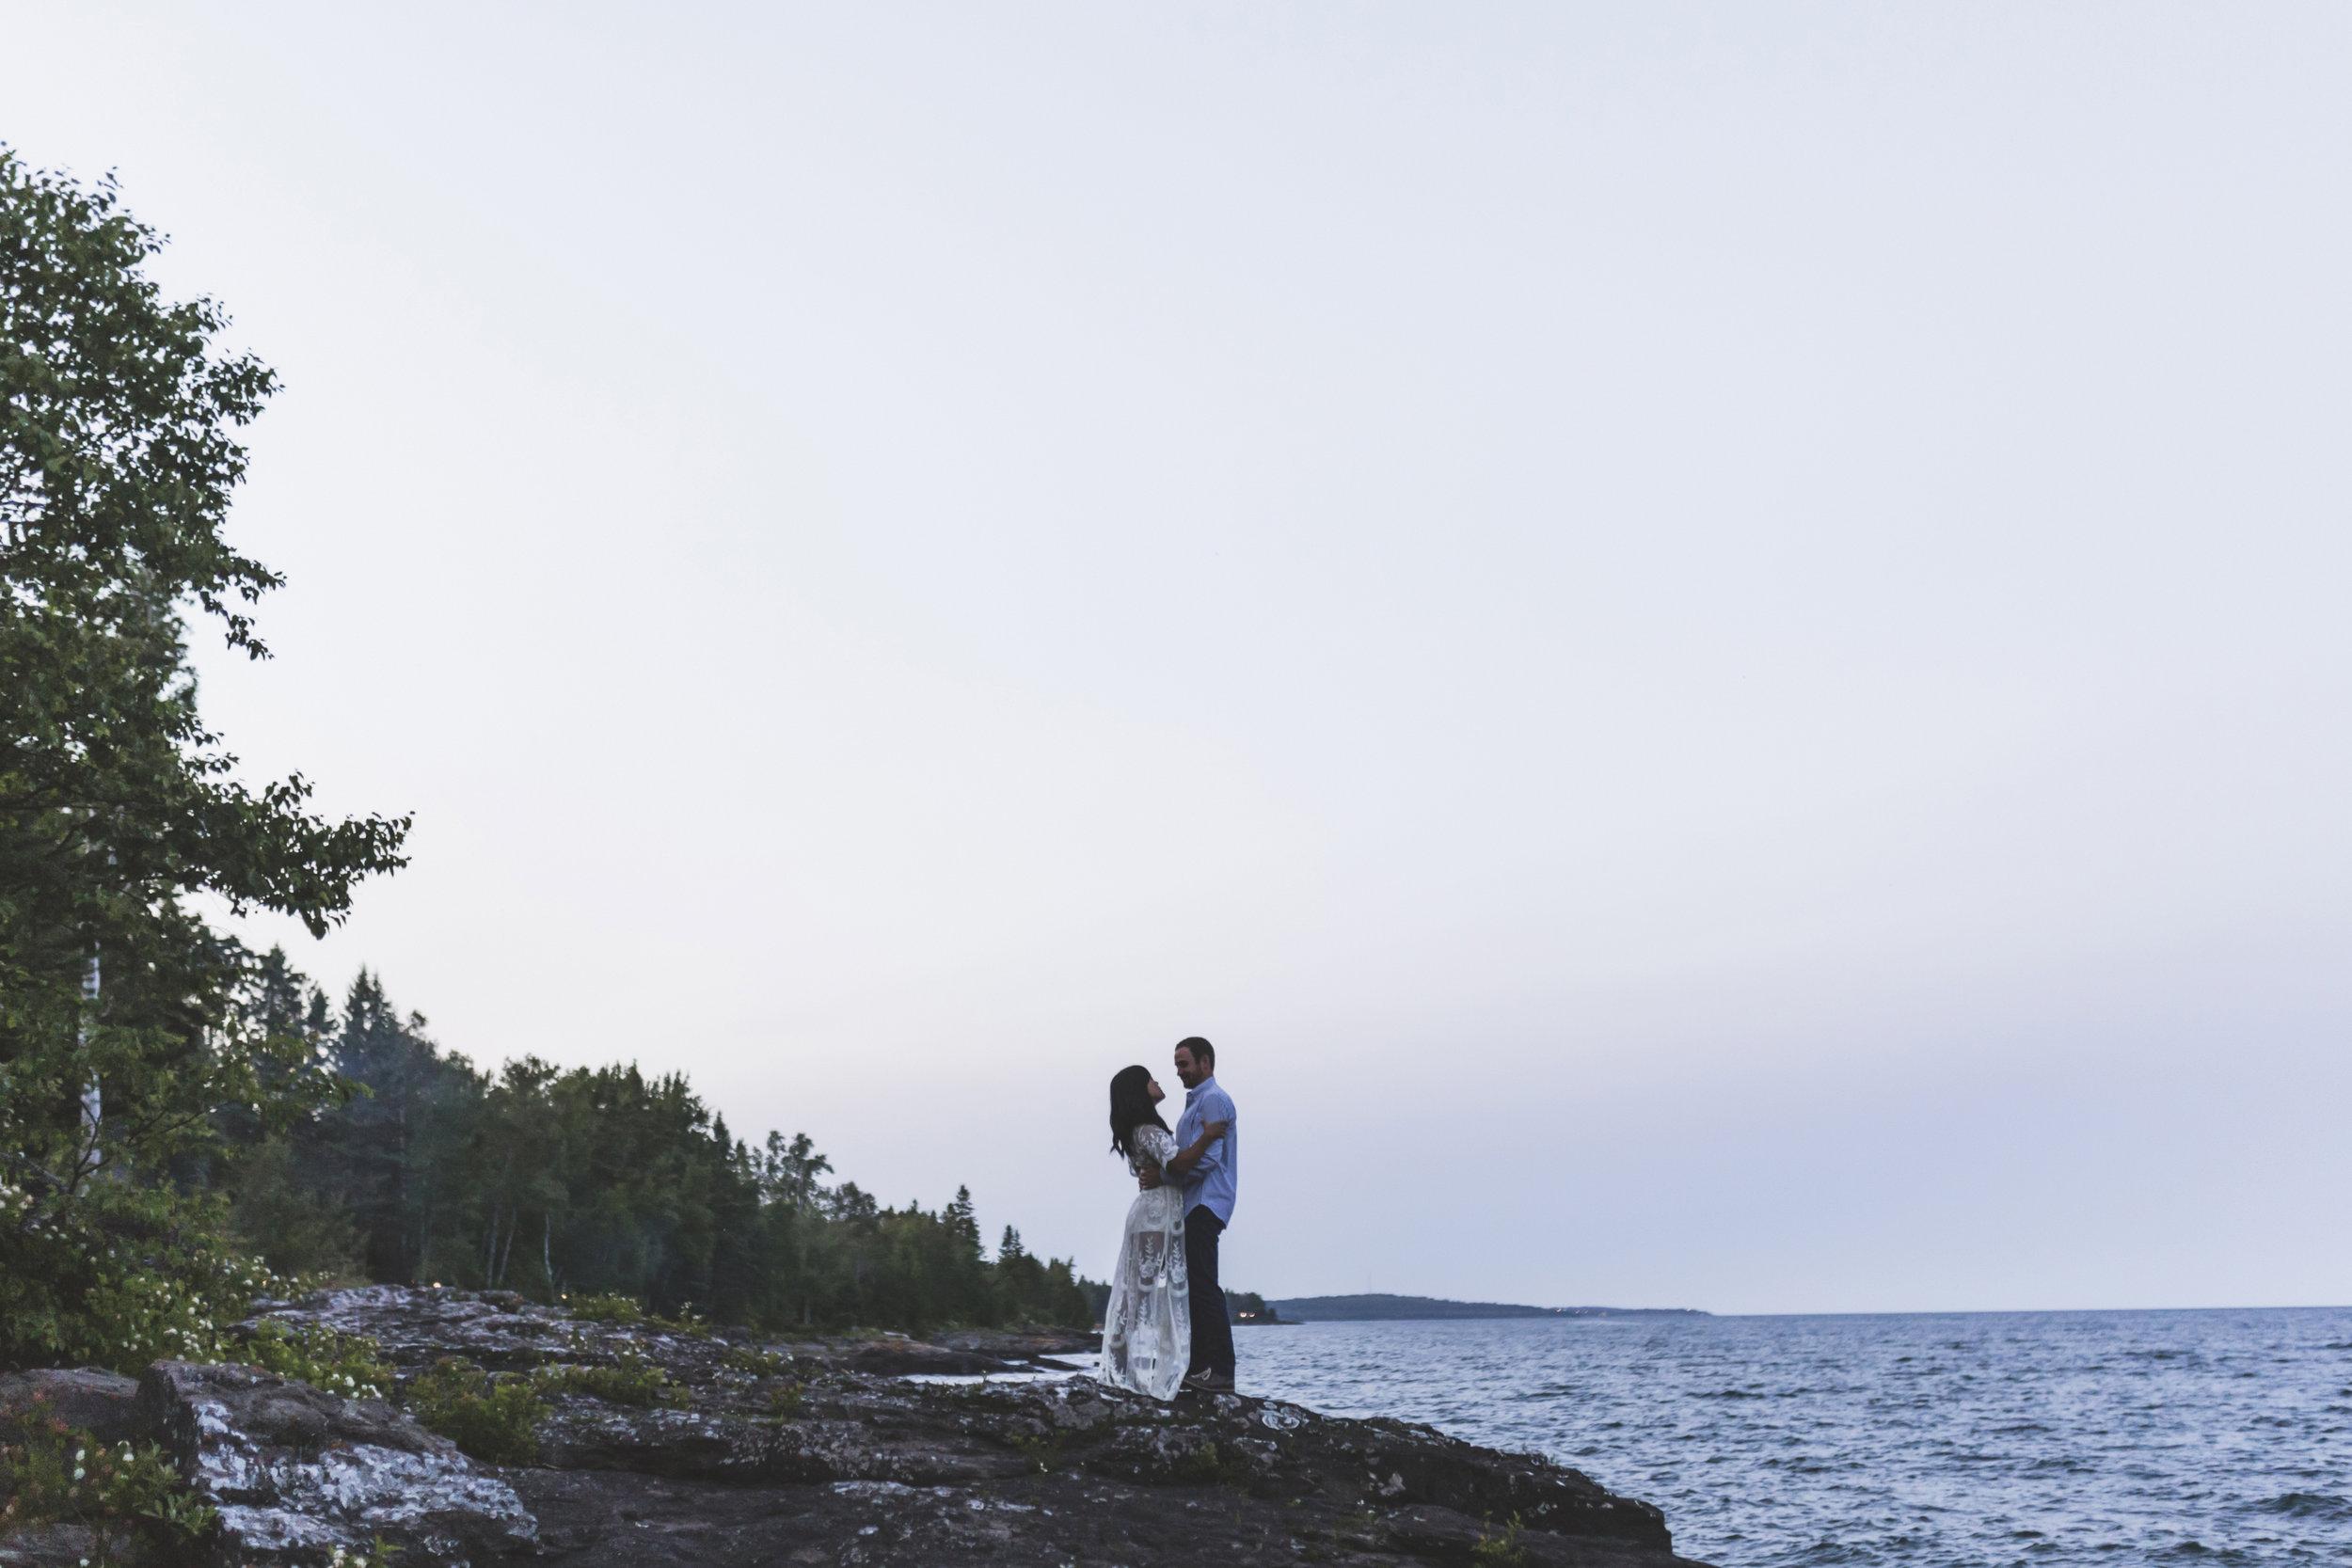 north shore minnesota engagement wedding photographer-67.jpg